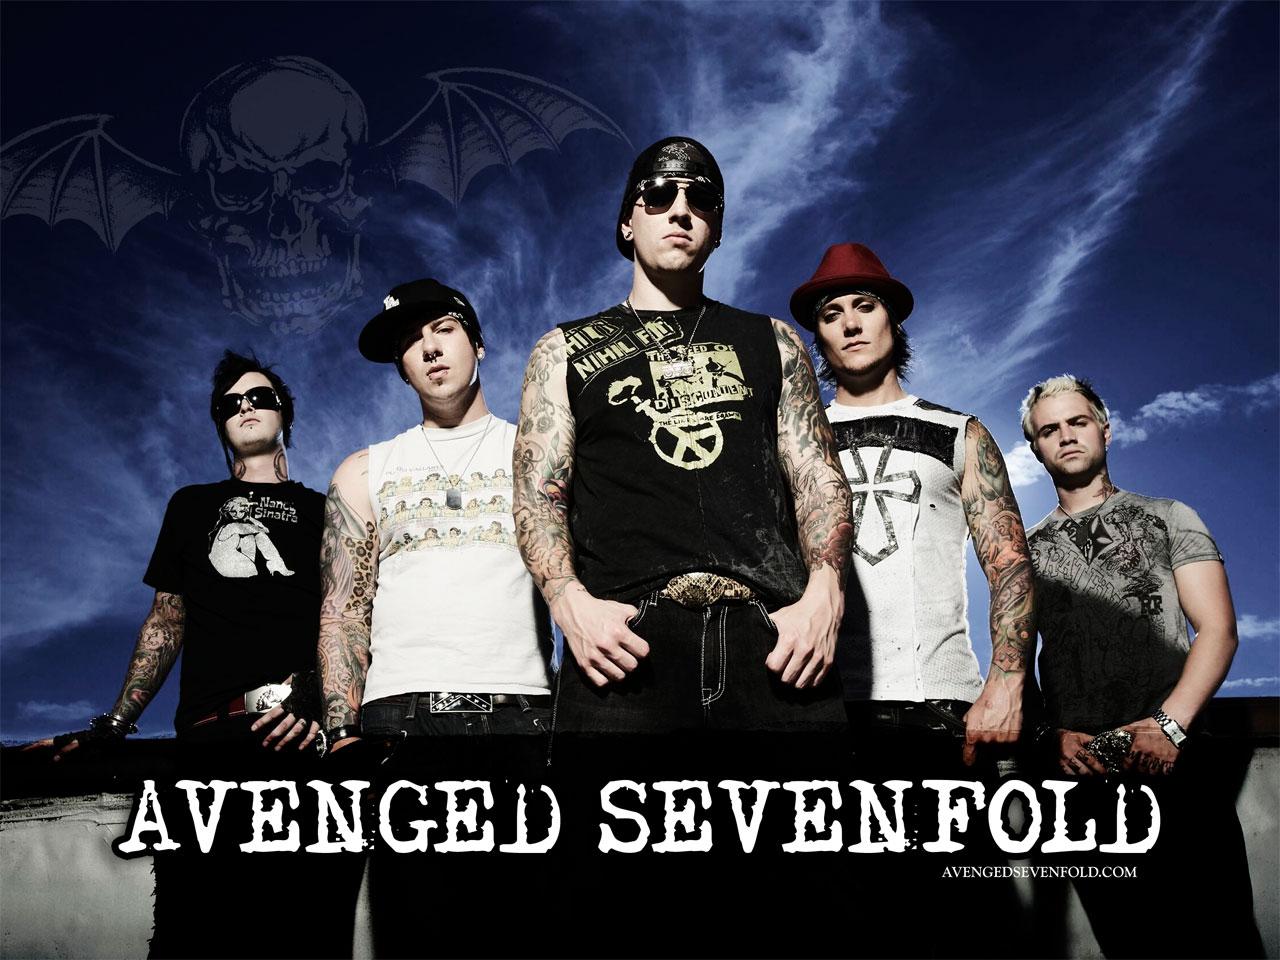 http://2.bp.blogspot.com/-J80LkhkP2iQ/ThnSOI92gJI/AAAAAAAAArw/n3bPPB6HZdE/s1600/avenged_Sevenfold_MP3.jpg